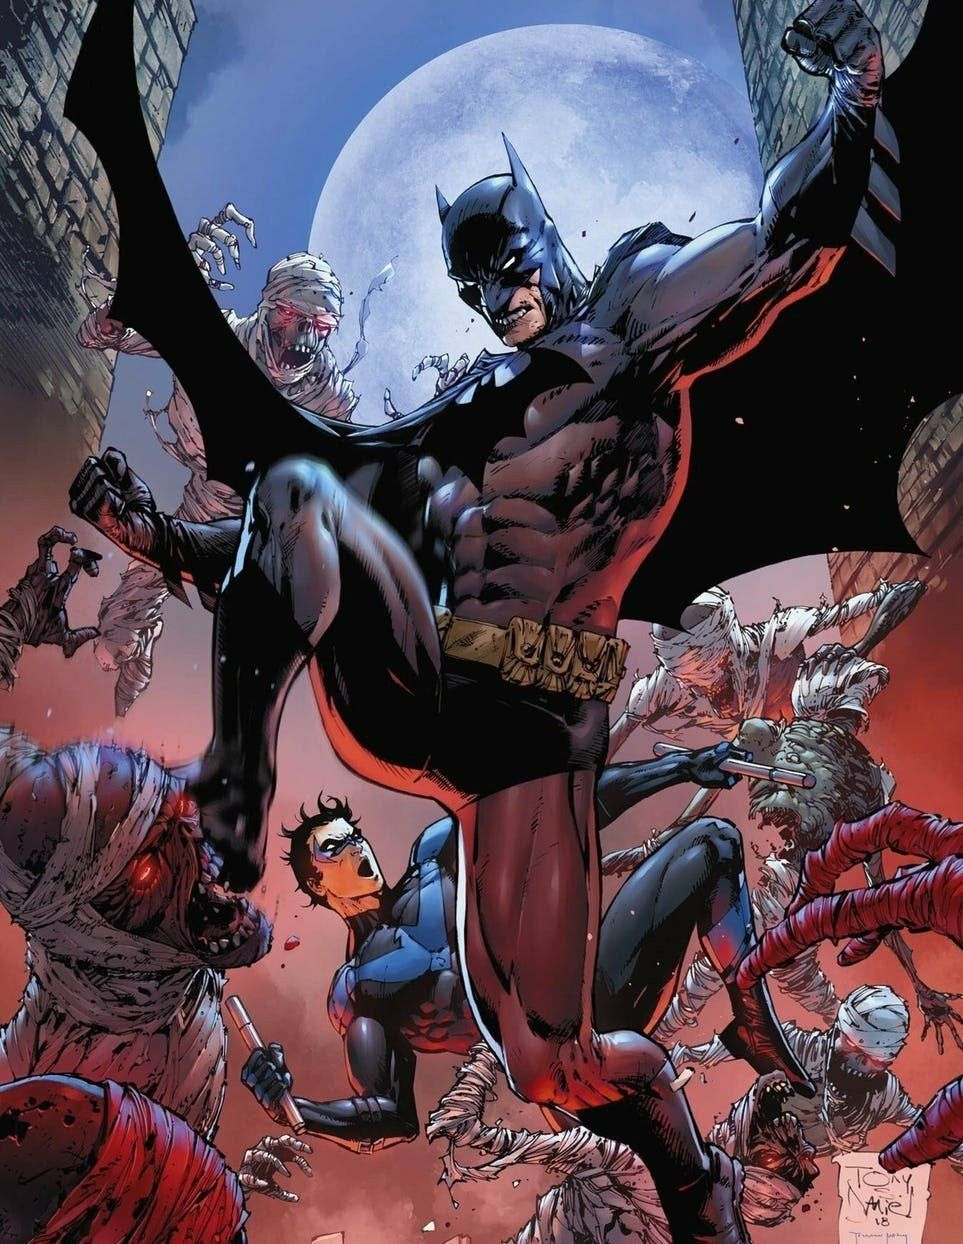 Pin by Chucky DZ on The Batman | Batman, Pop culture, Anime